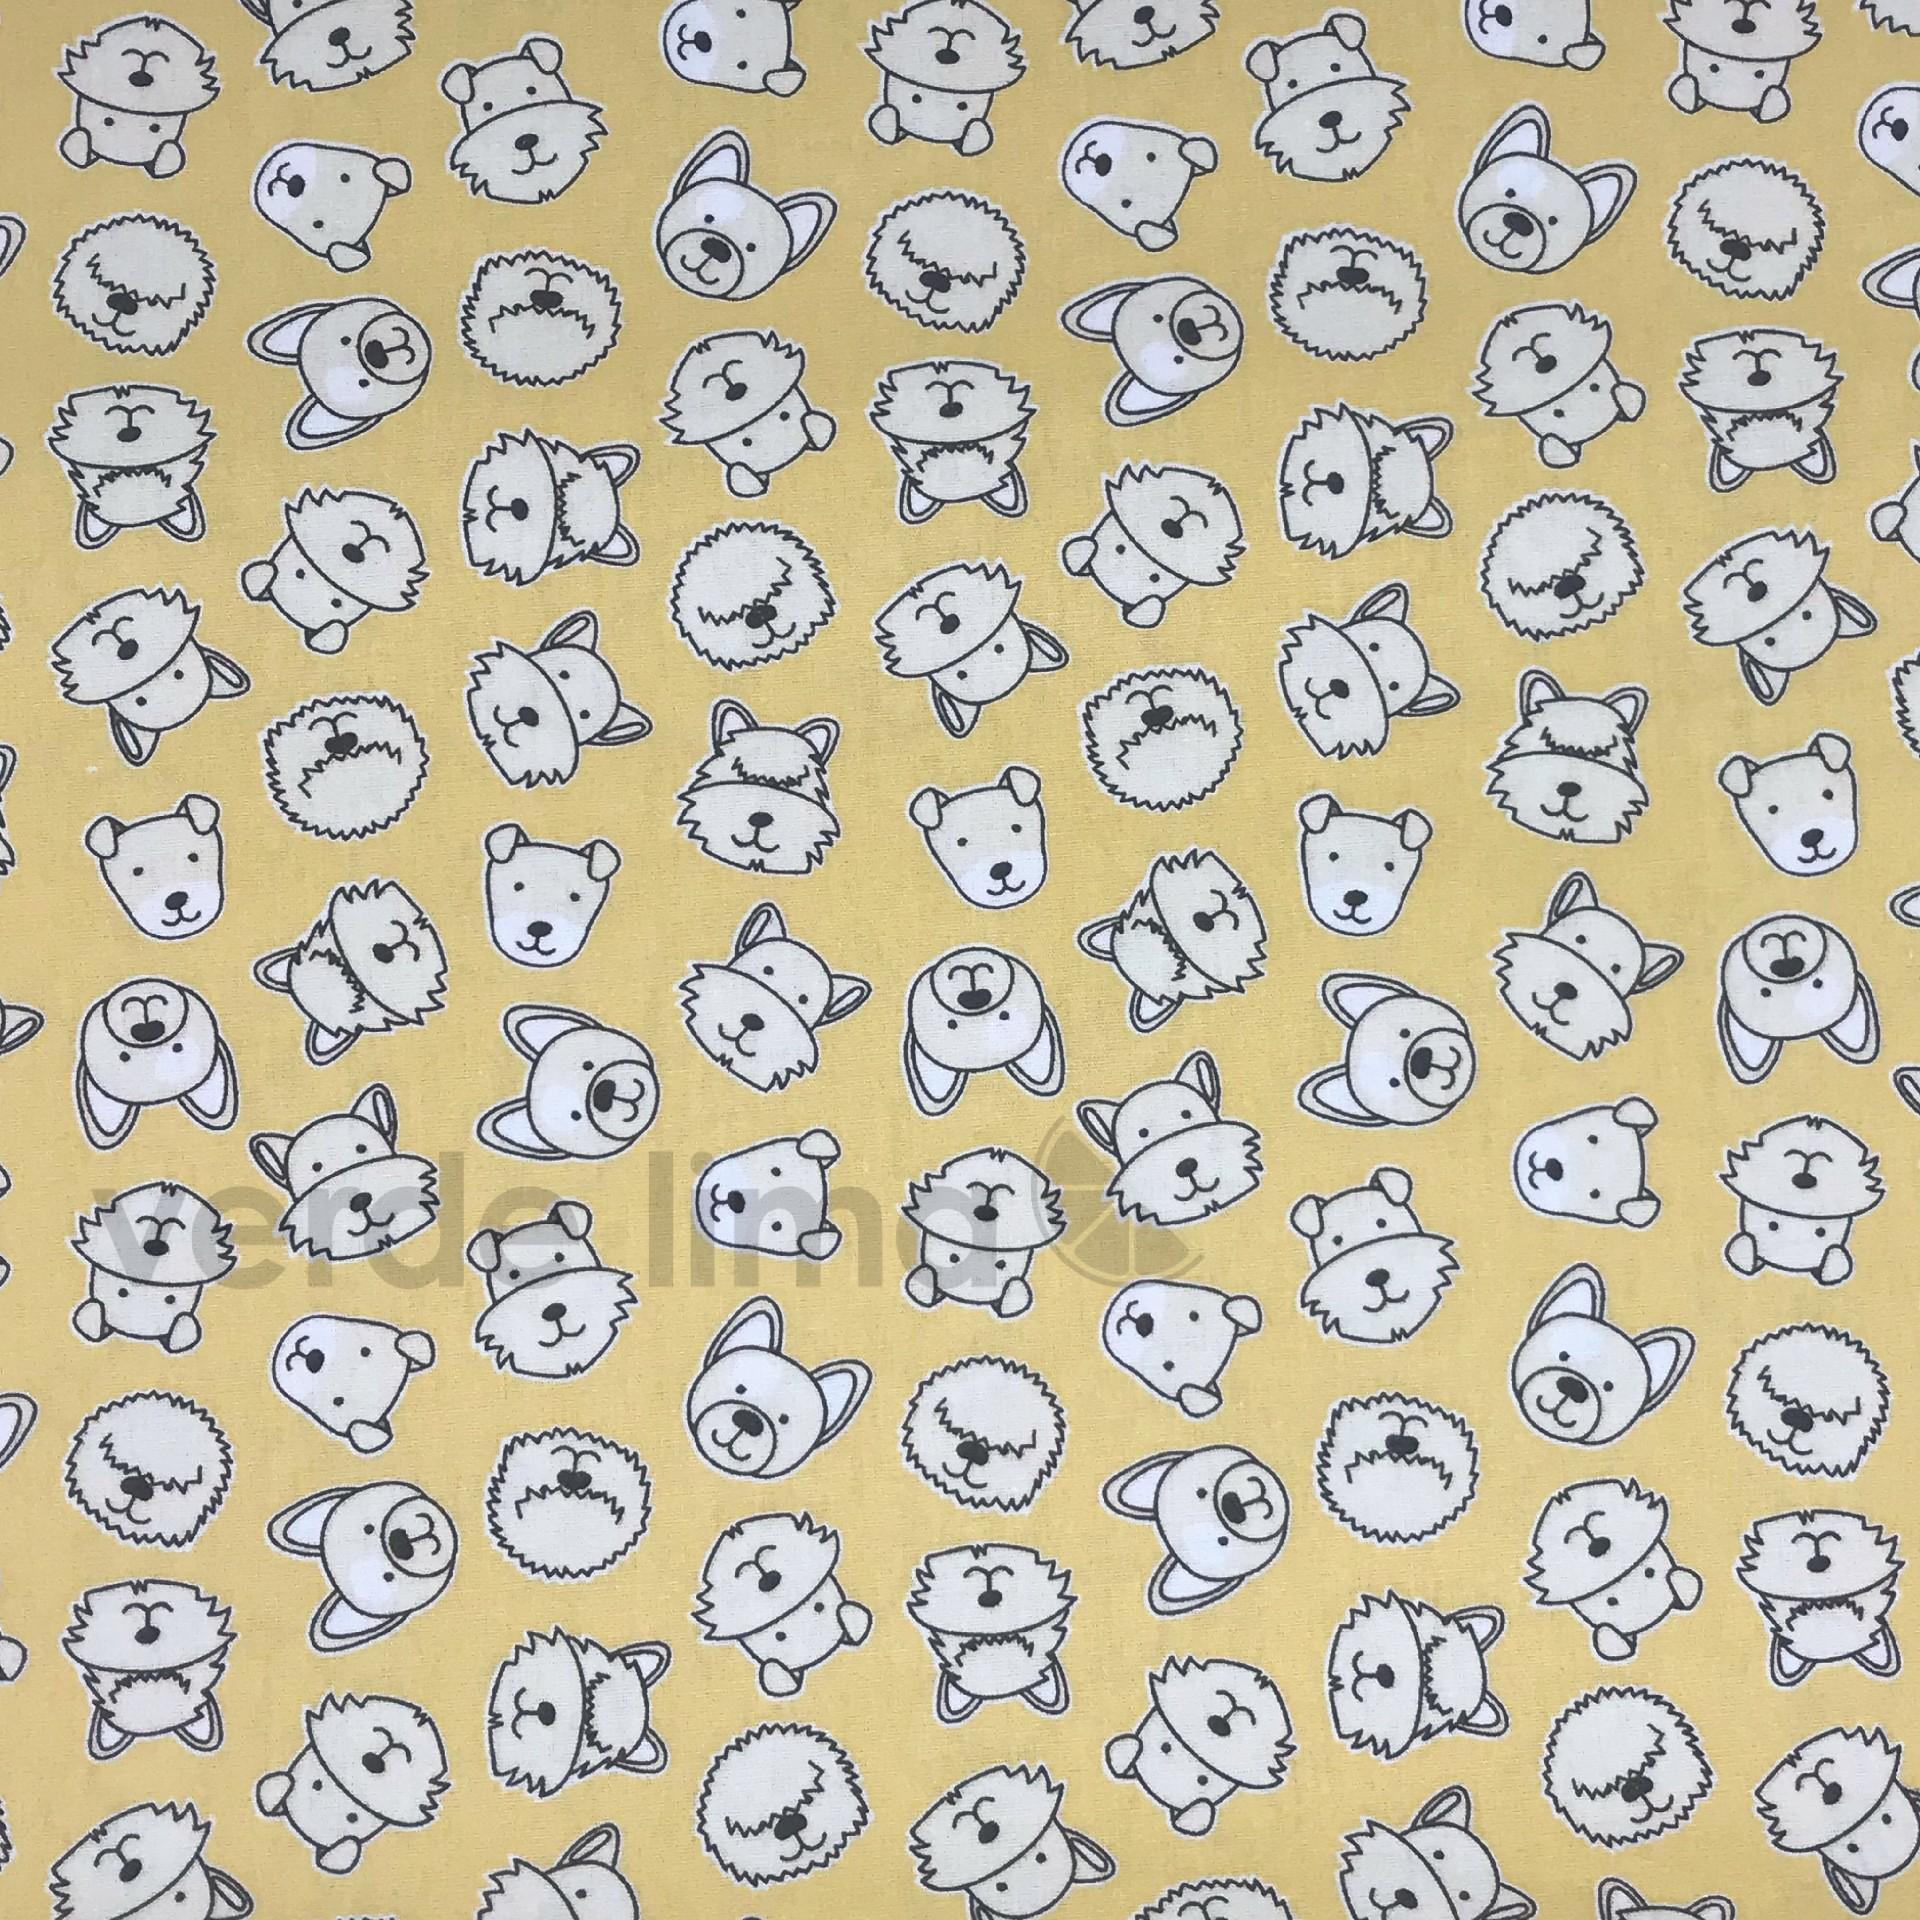 Cachorros fundo amarelo